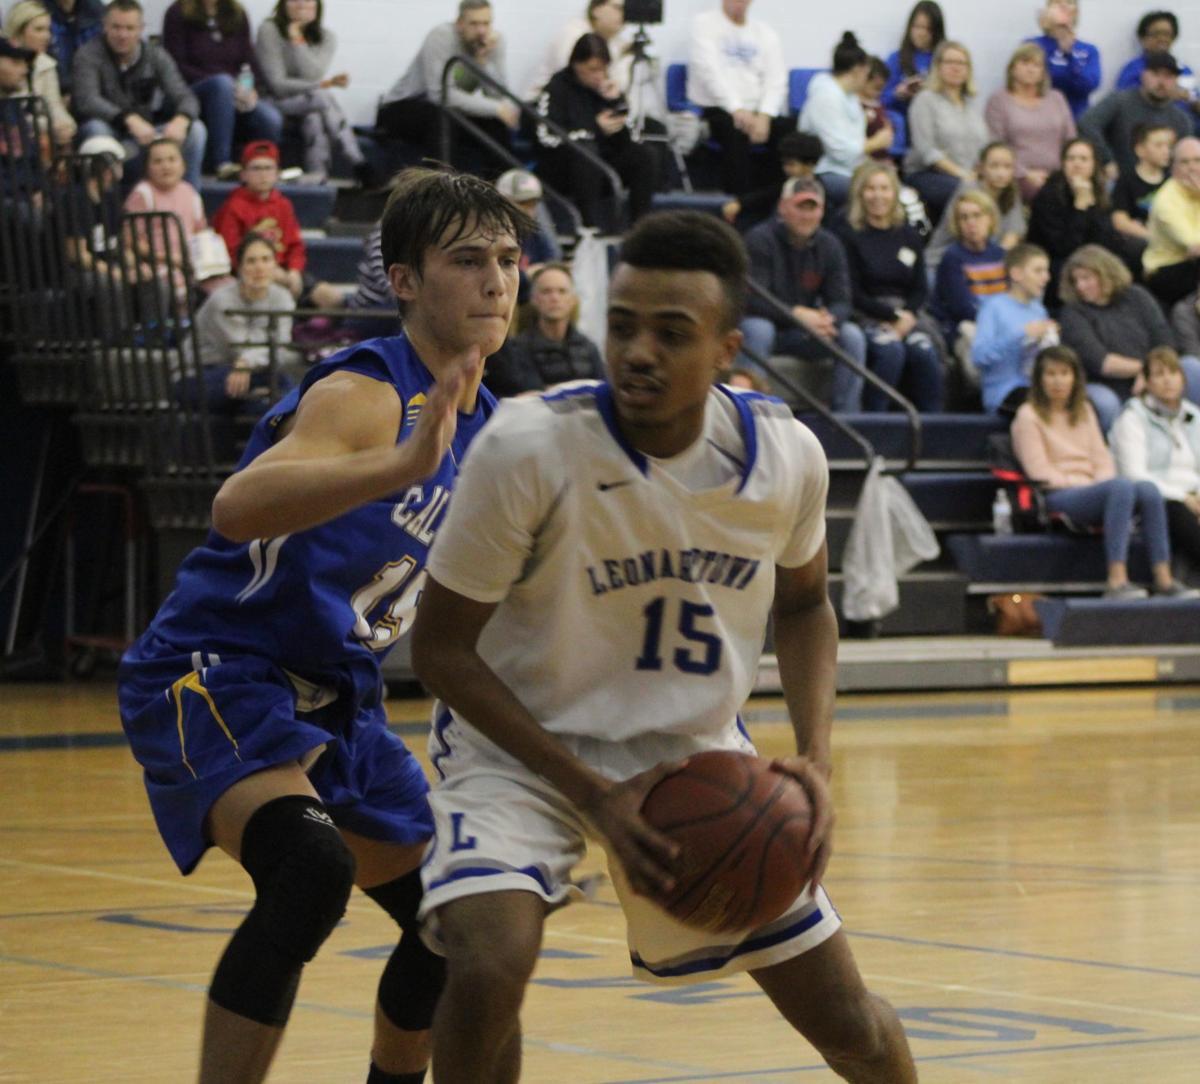 Tyreke Herbert (Leonardtown boys basketball)